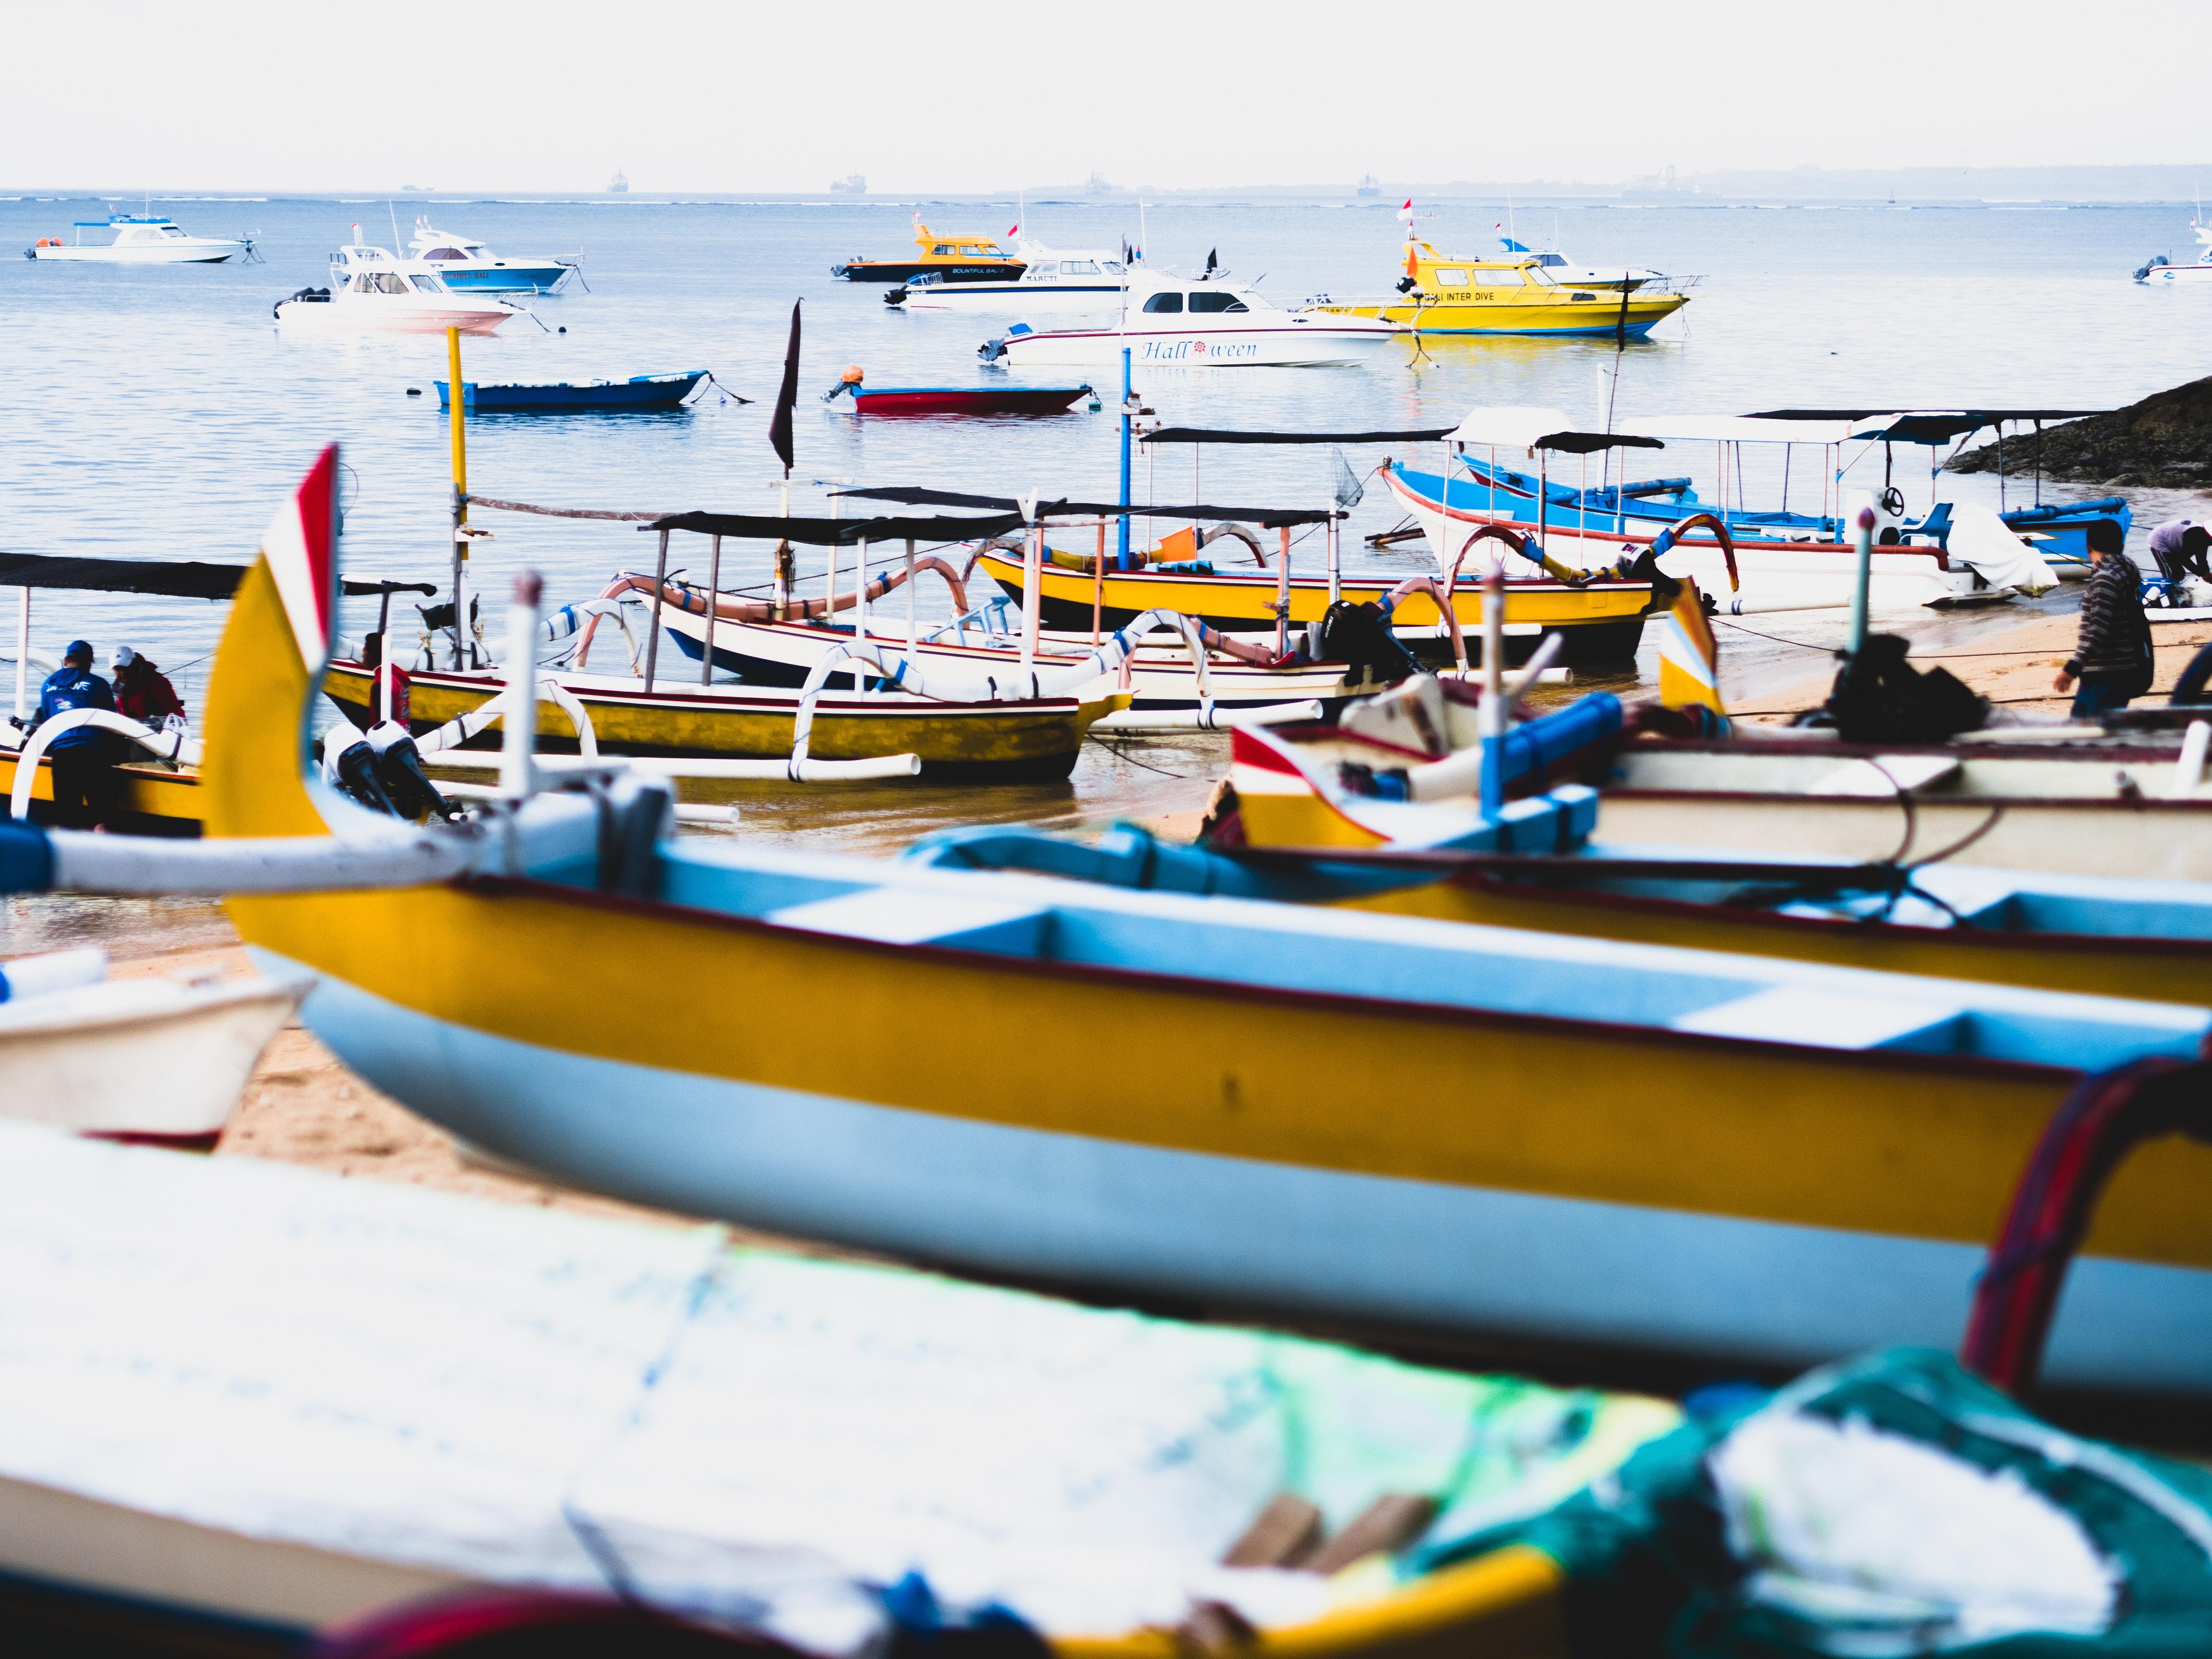 Group of Boats on Sea, Beach, Boats, Horizon, Ocean, HQ Photo